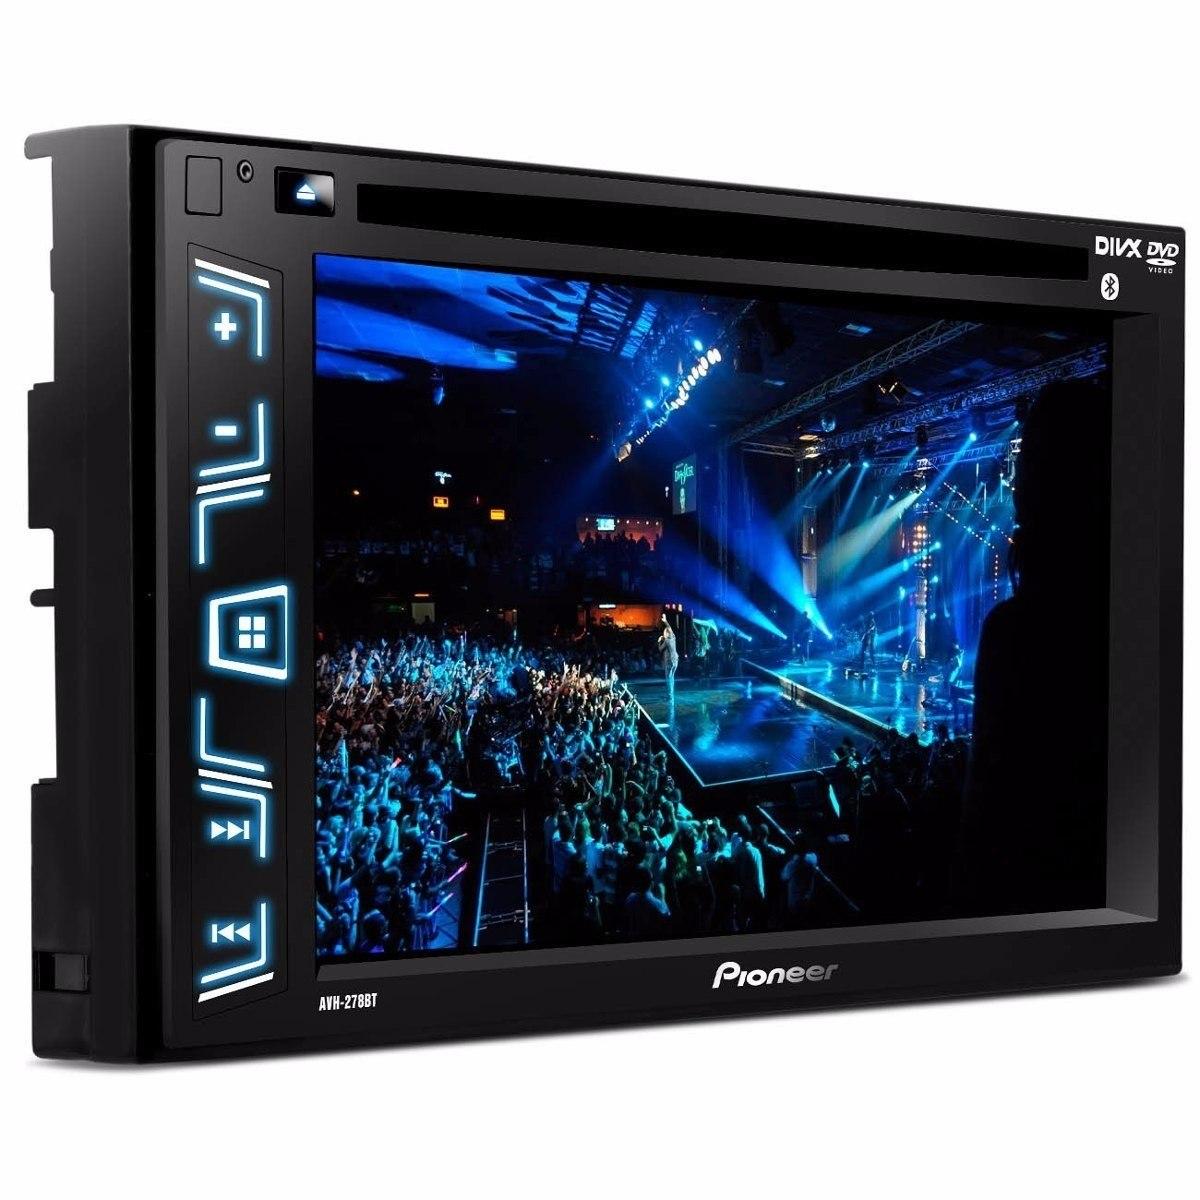 dvd-automotivo-pioneer-D_NQ_NP_824221-MLB20729253032_052016-F.jpg